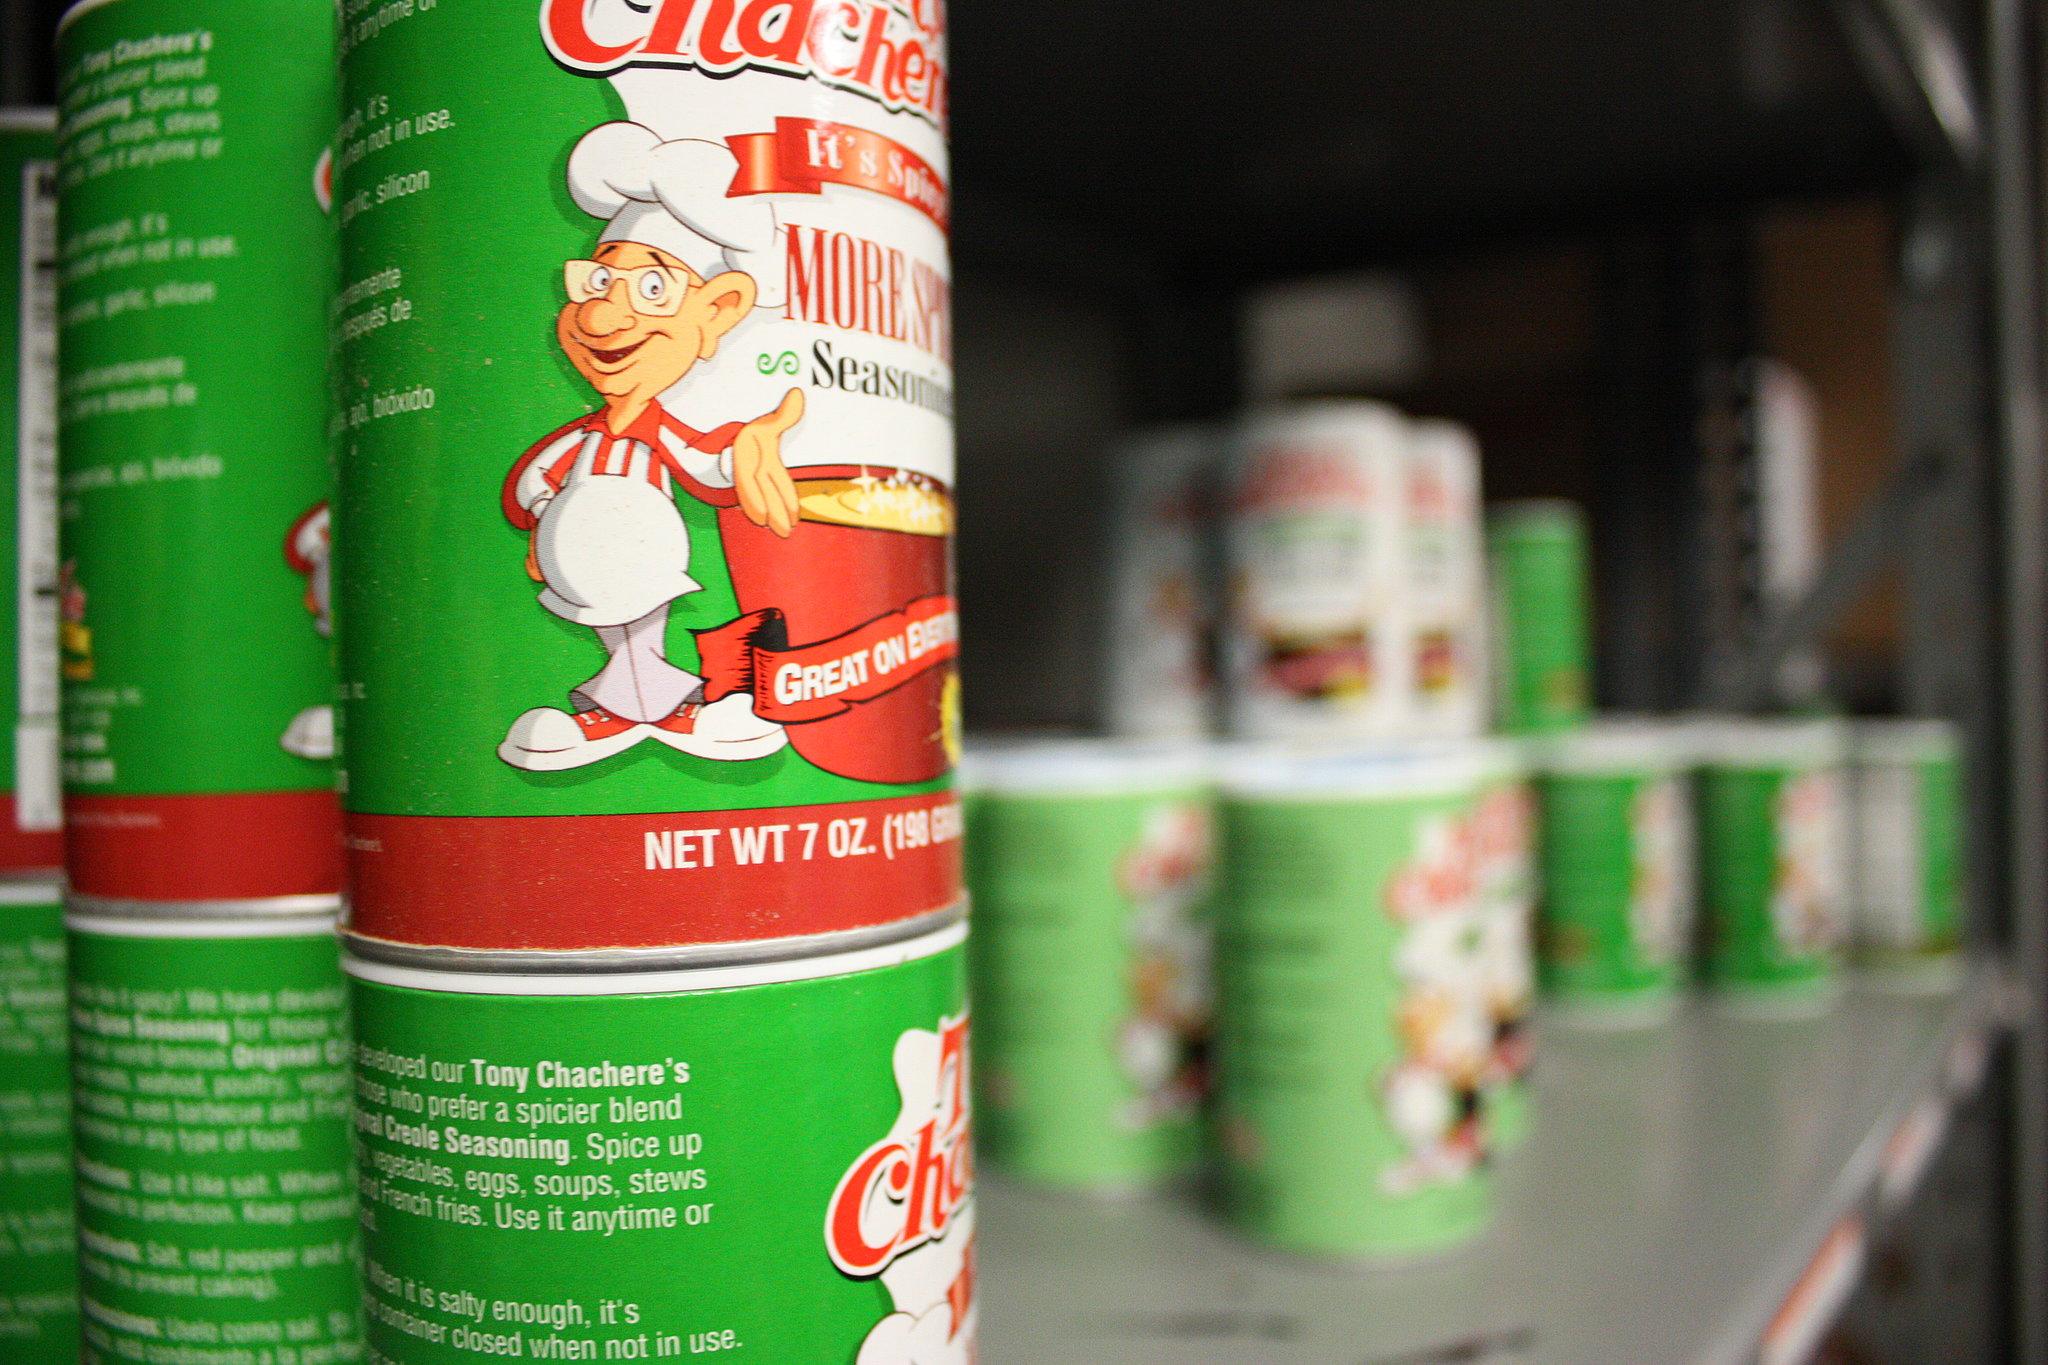 Tony Chachere's Original Creole Seasoning